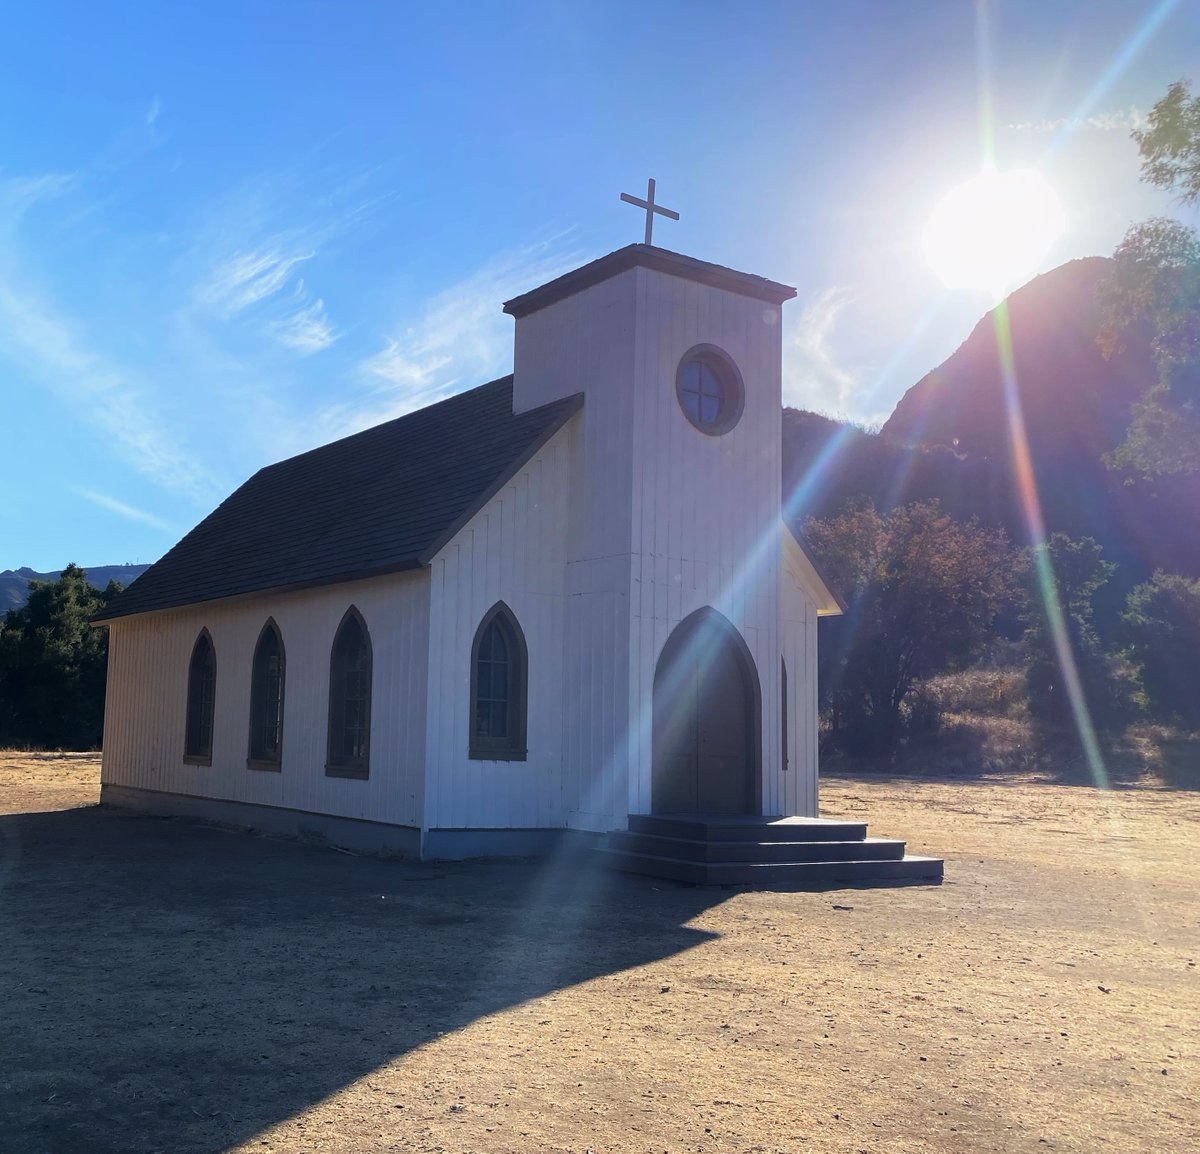 HOPE - The Sun Will Shine Again ! @MalibuPatch @TheMalibuTimes #sunshine #churches #Country